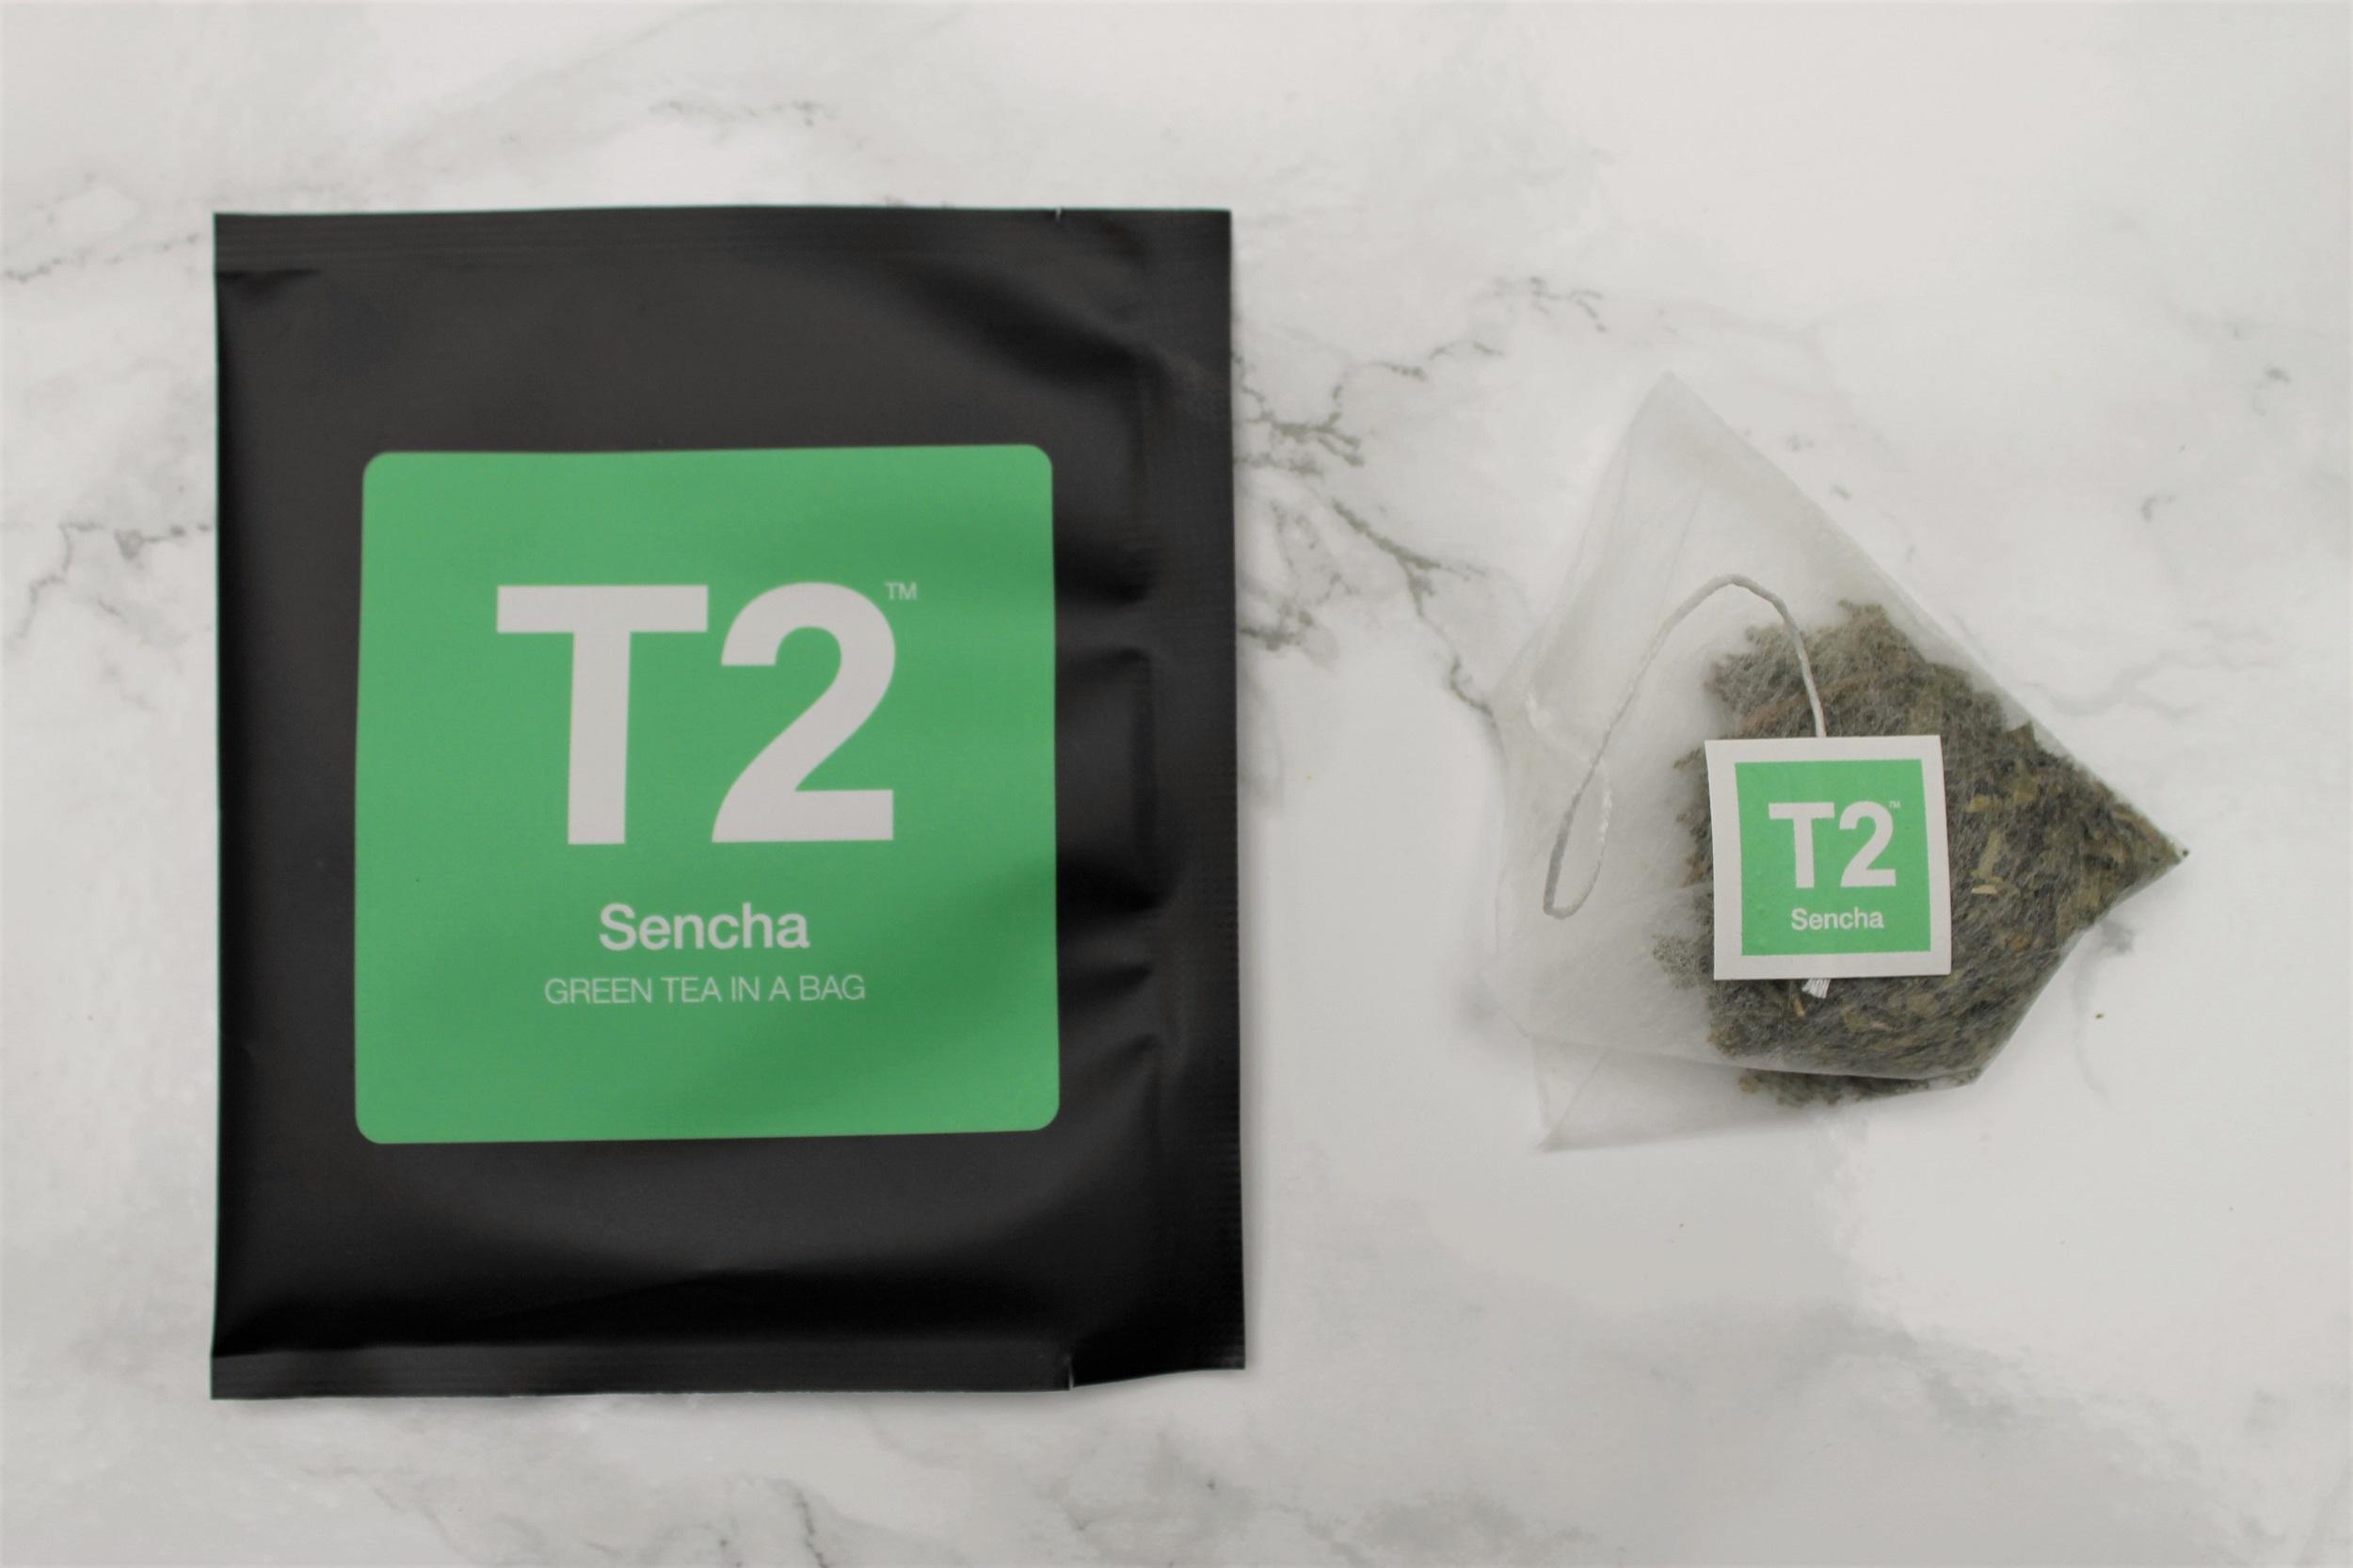 t2 sencha teabag